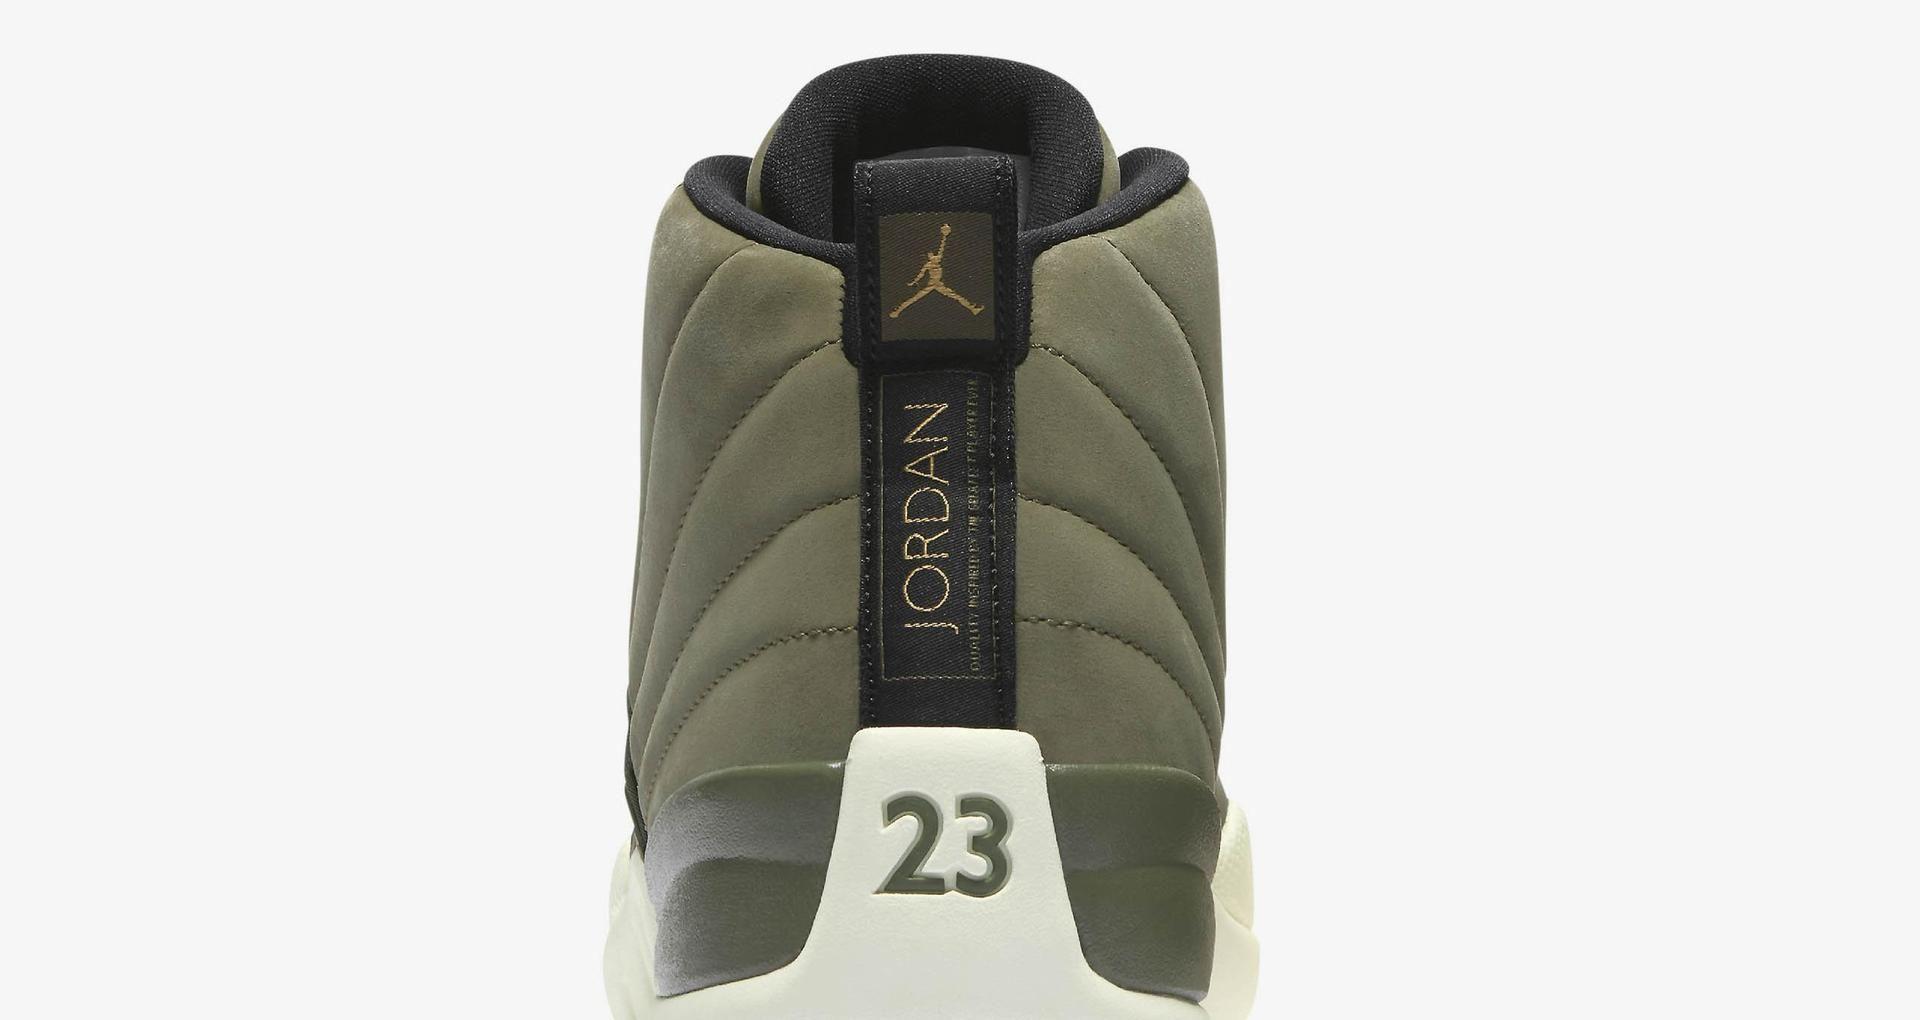 64601e25786 Air Jordan 12 Retro 'Olive Canvas & Metallic Gold' Release Date ...